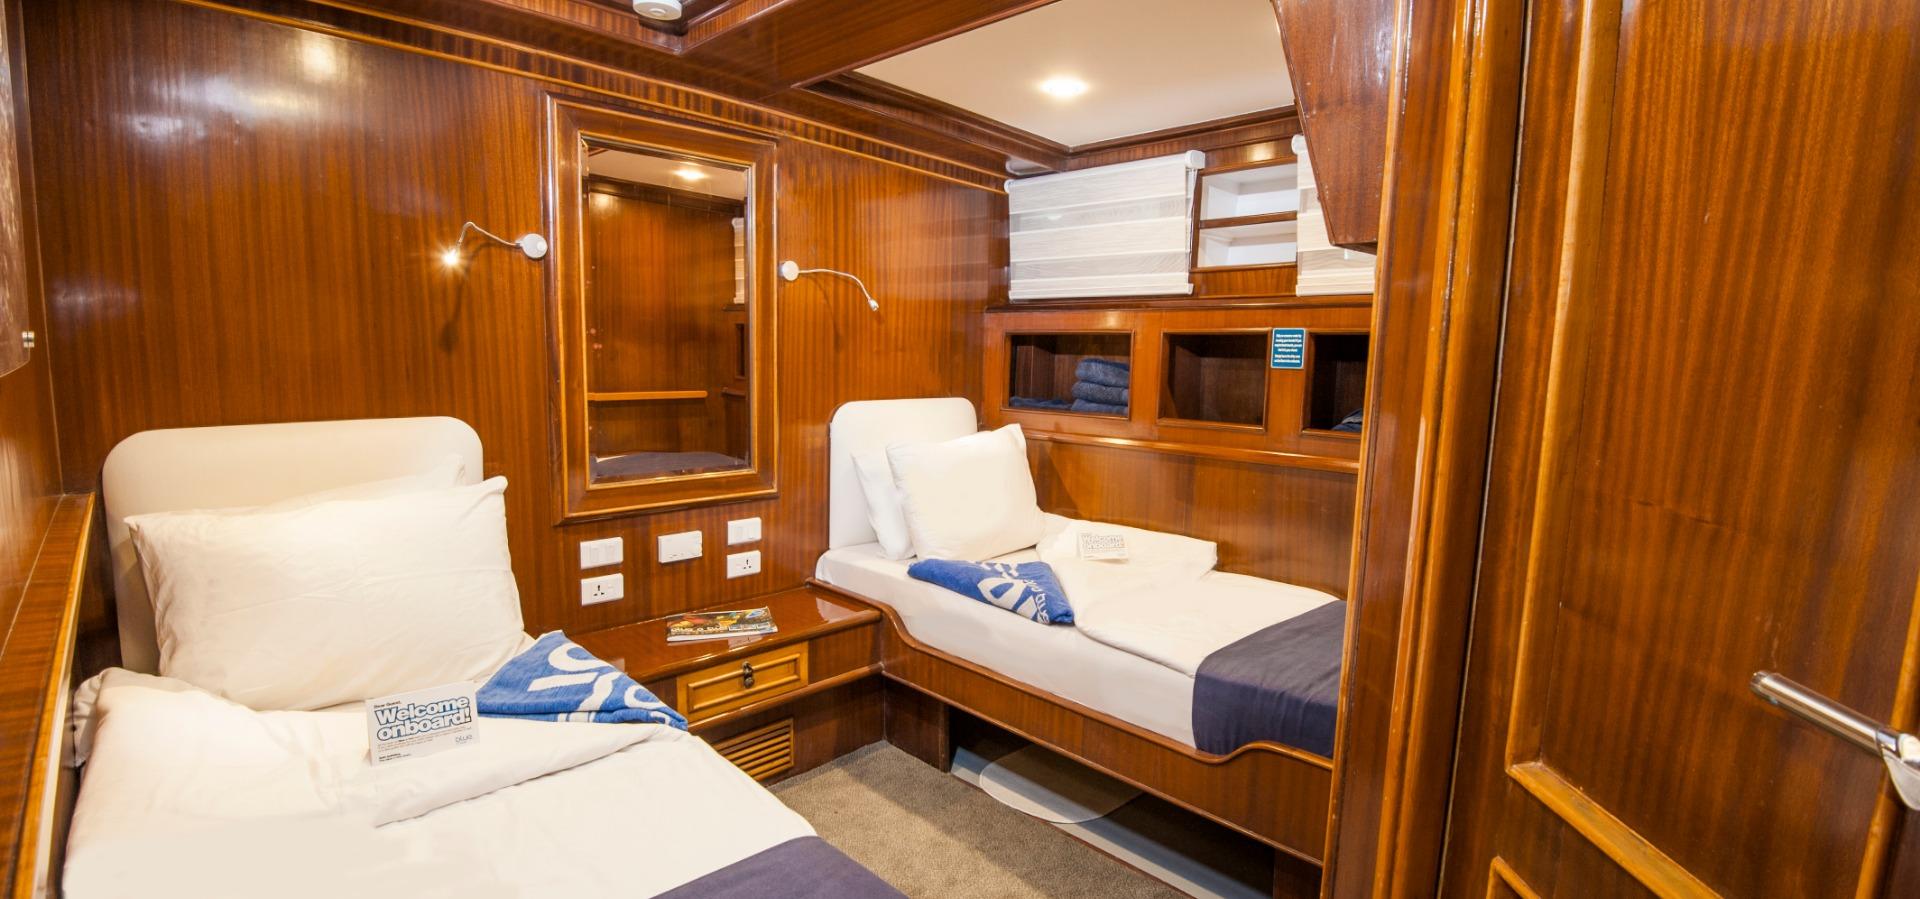 Twin cabin aboard M/Y blue Melody liveaboard diving vessel, Red Sea